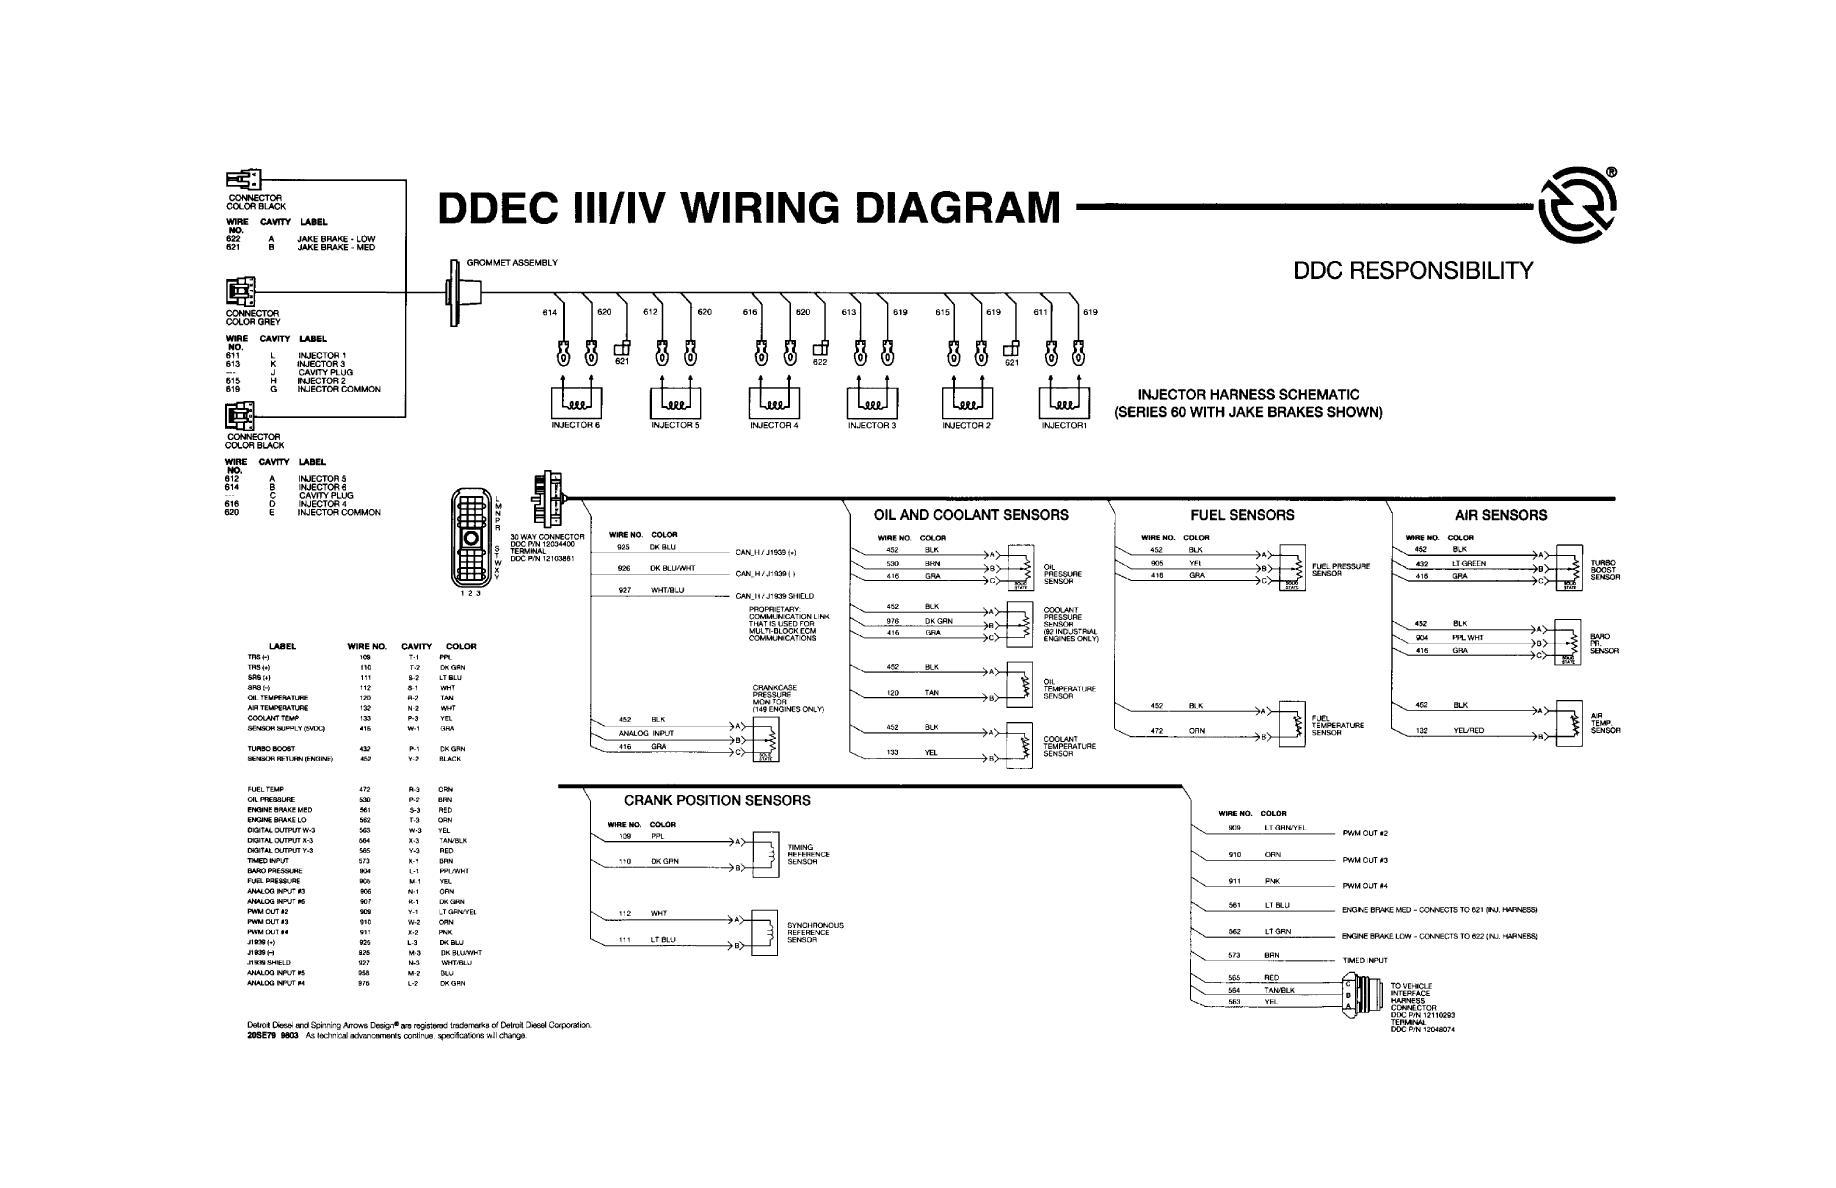 hight resolution of ddec iv wiring diagram detroit diesel series 60 diagram barddec iv wiring diagram detroit diesel